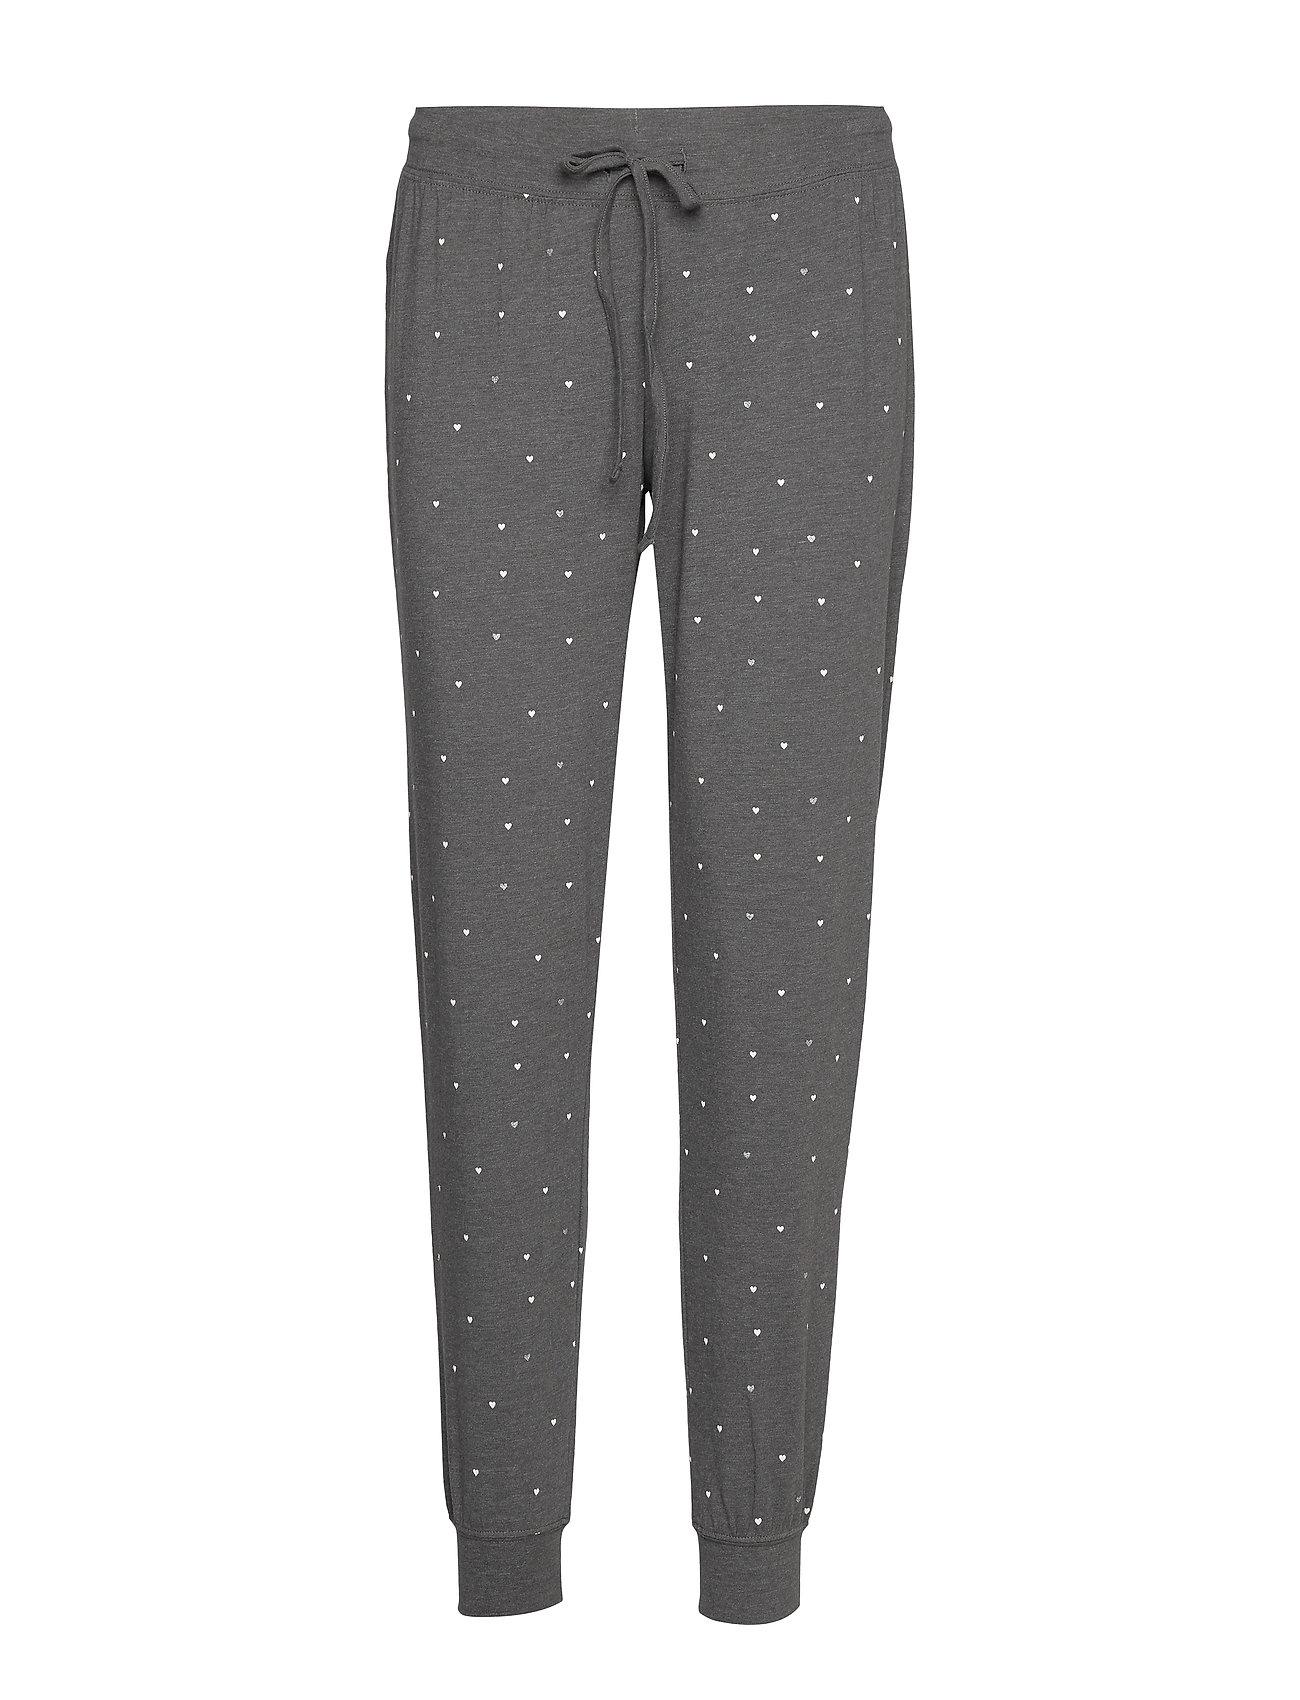 Night Trousers Tea Aop Pyjamasbukser Hyggebukser Grå Lindex